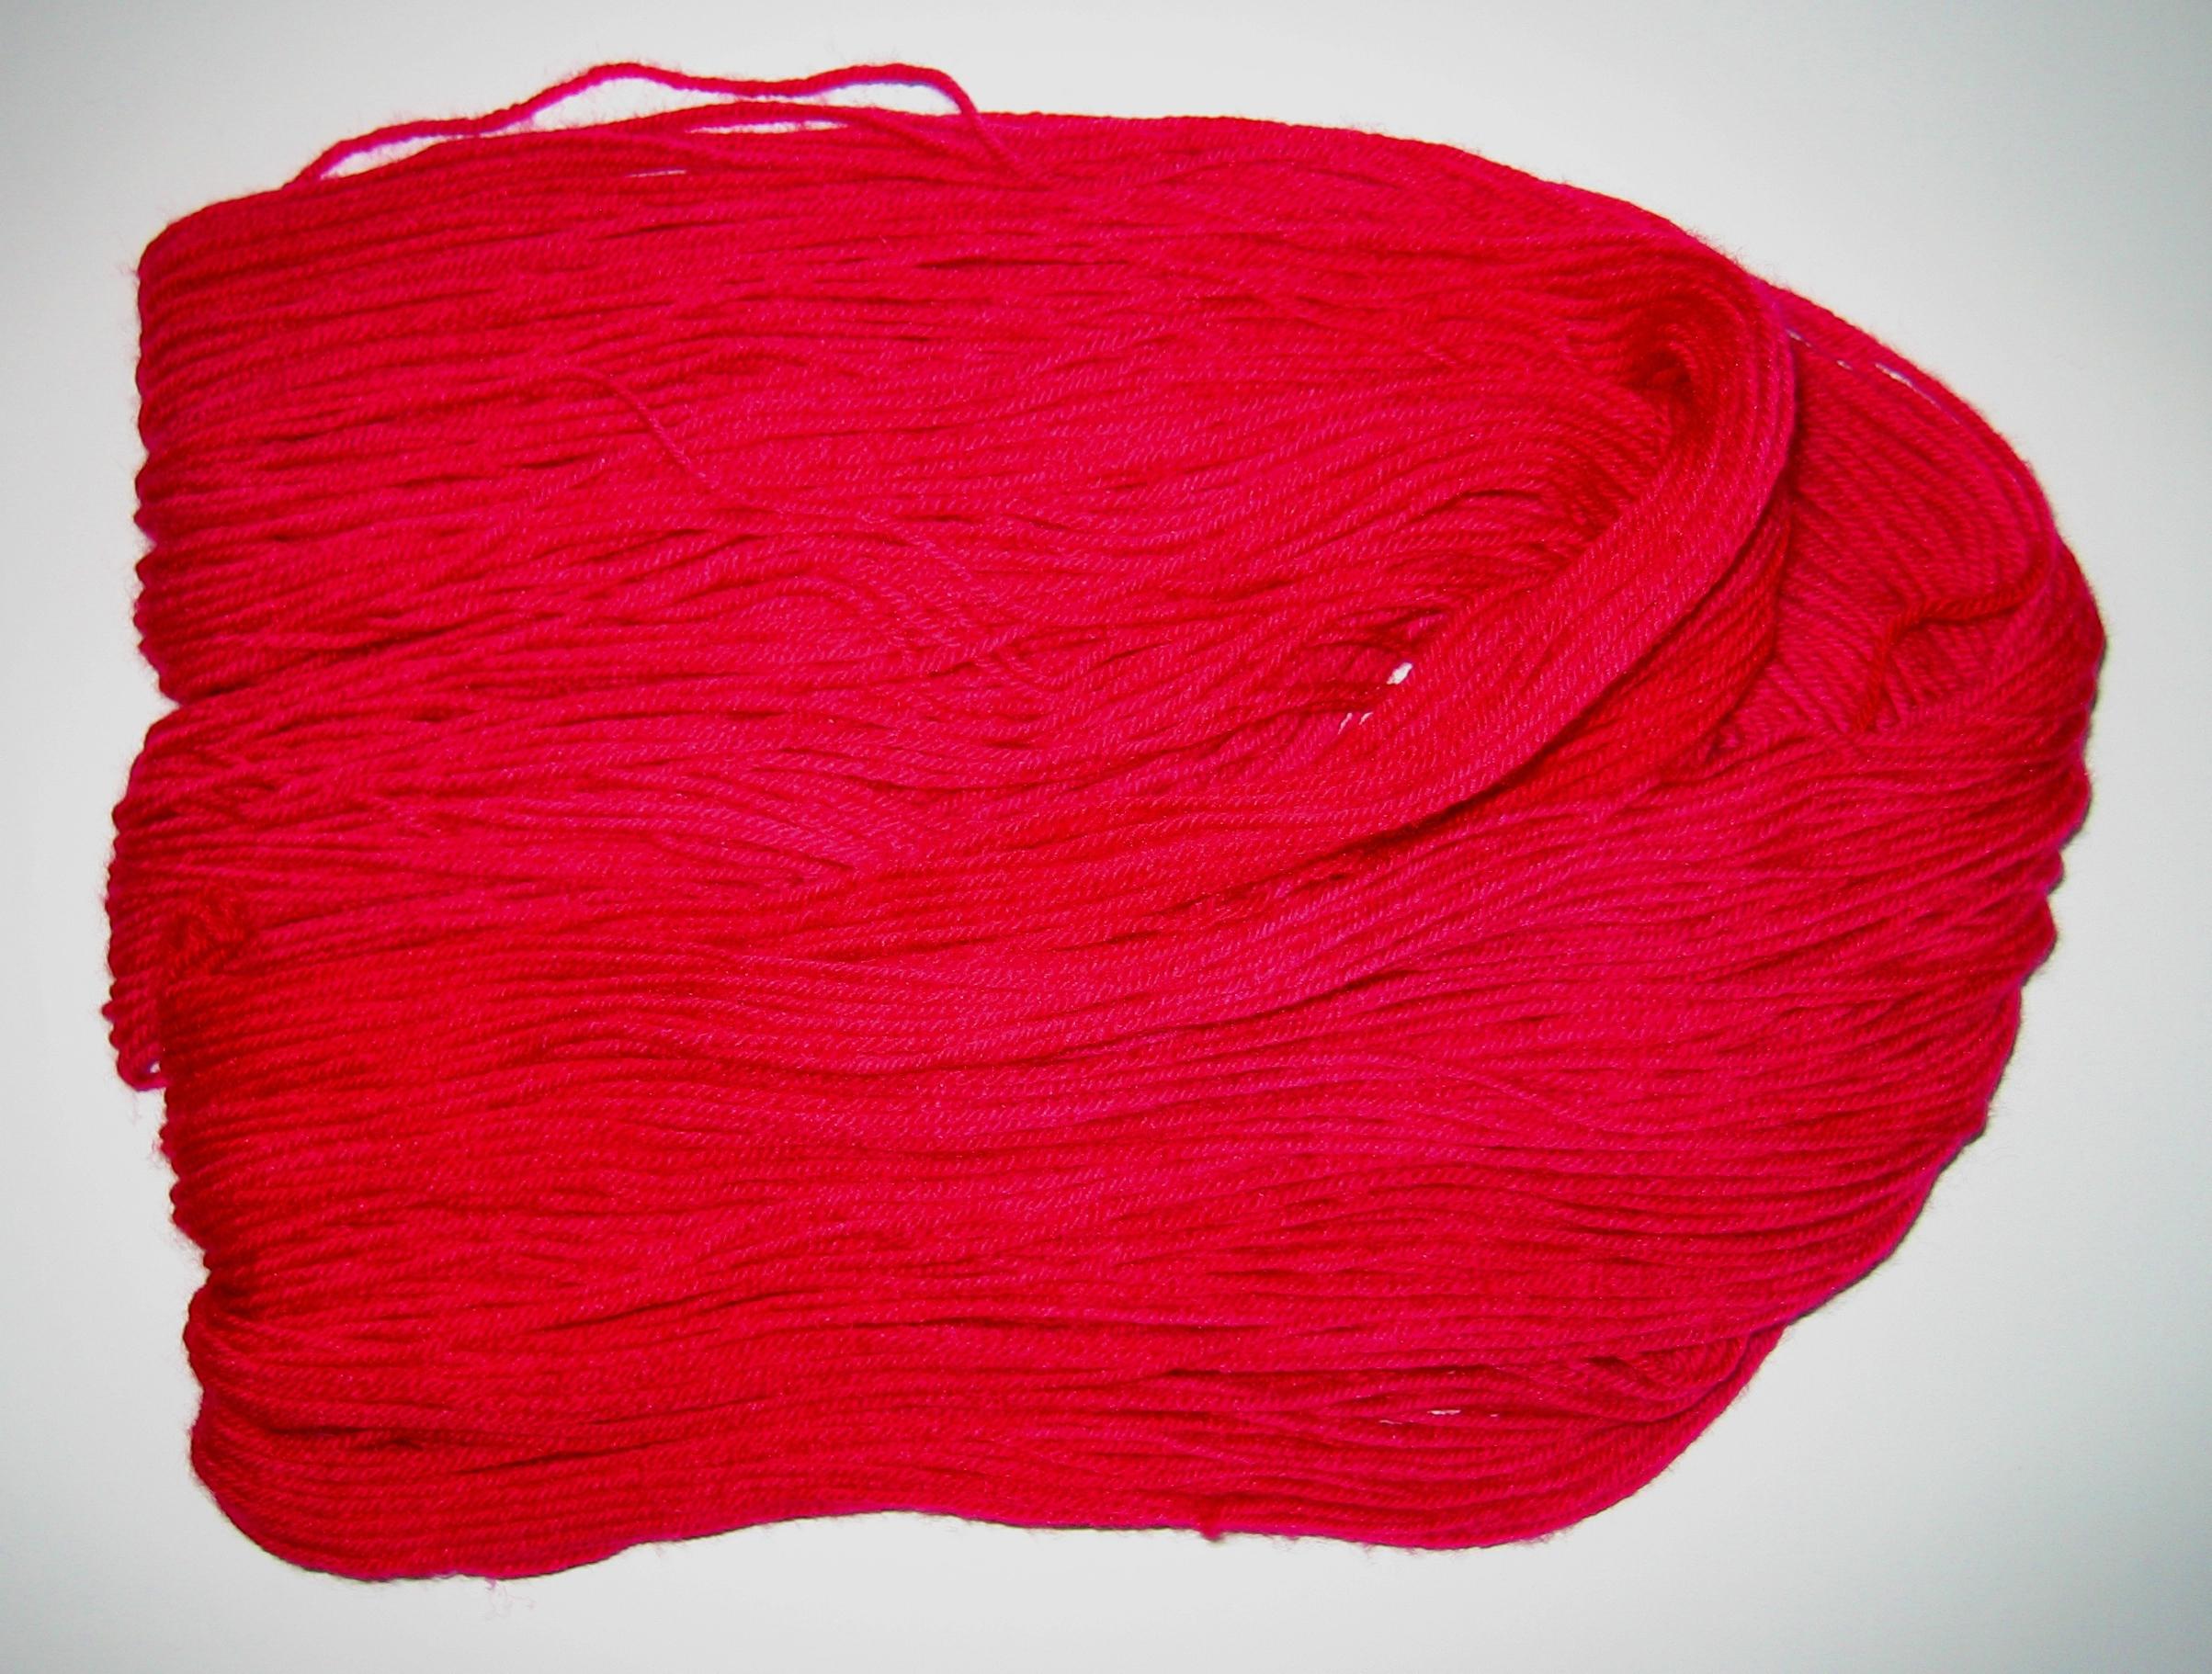 garnyarn-håndfarvet-garn-tynd-merino-nylon-heritage-moerkbaerpink